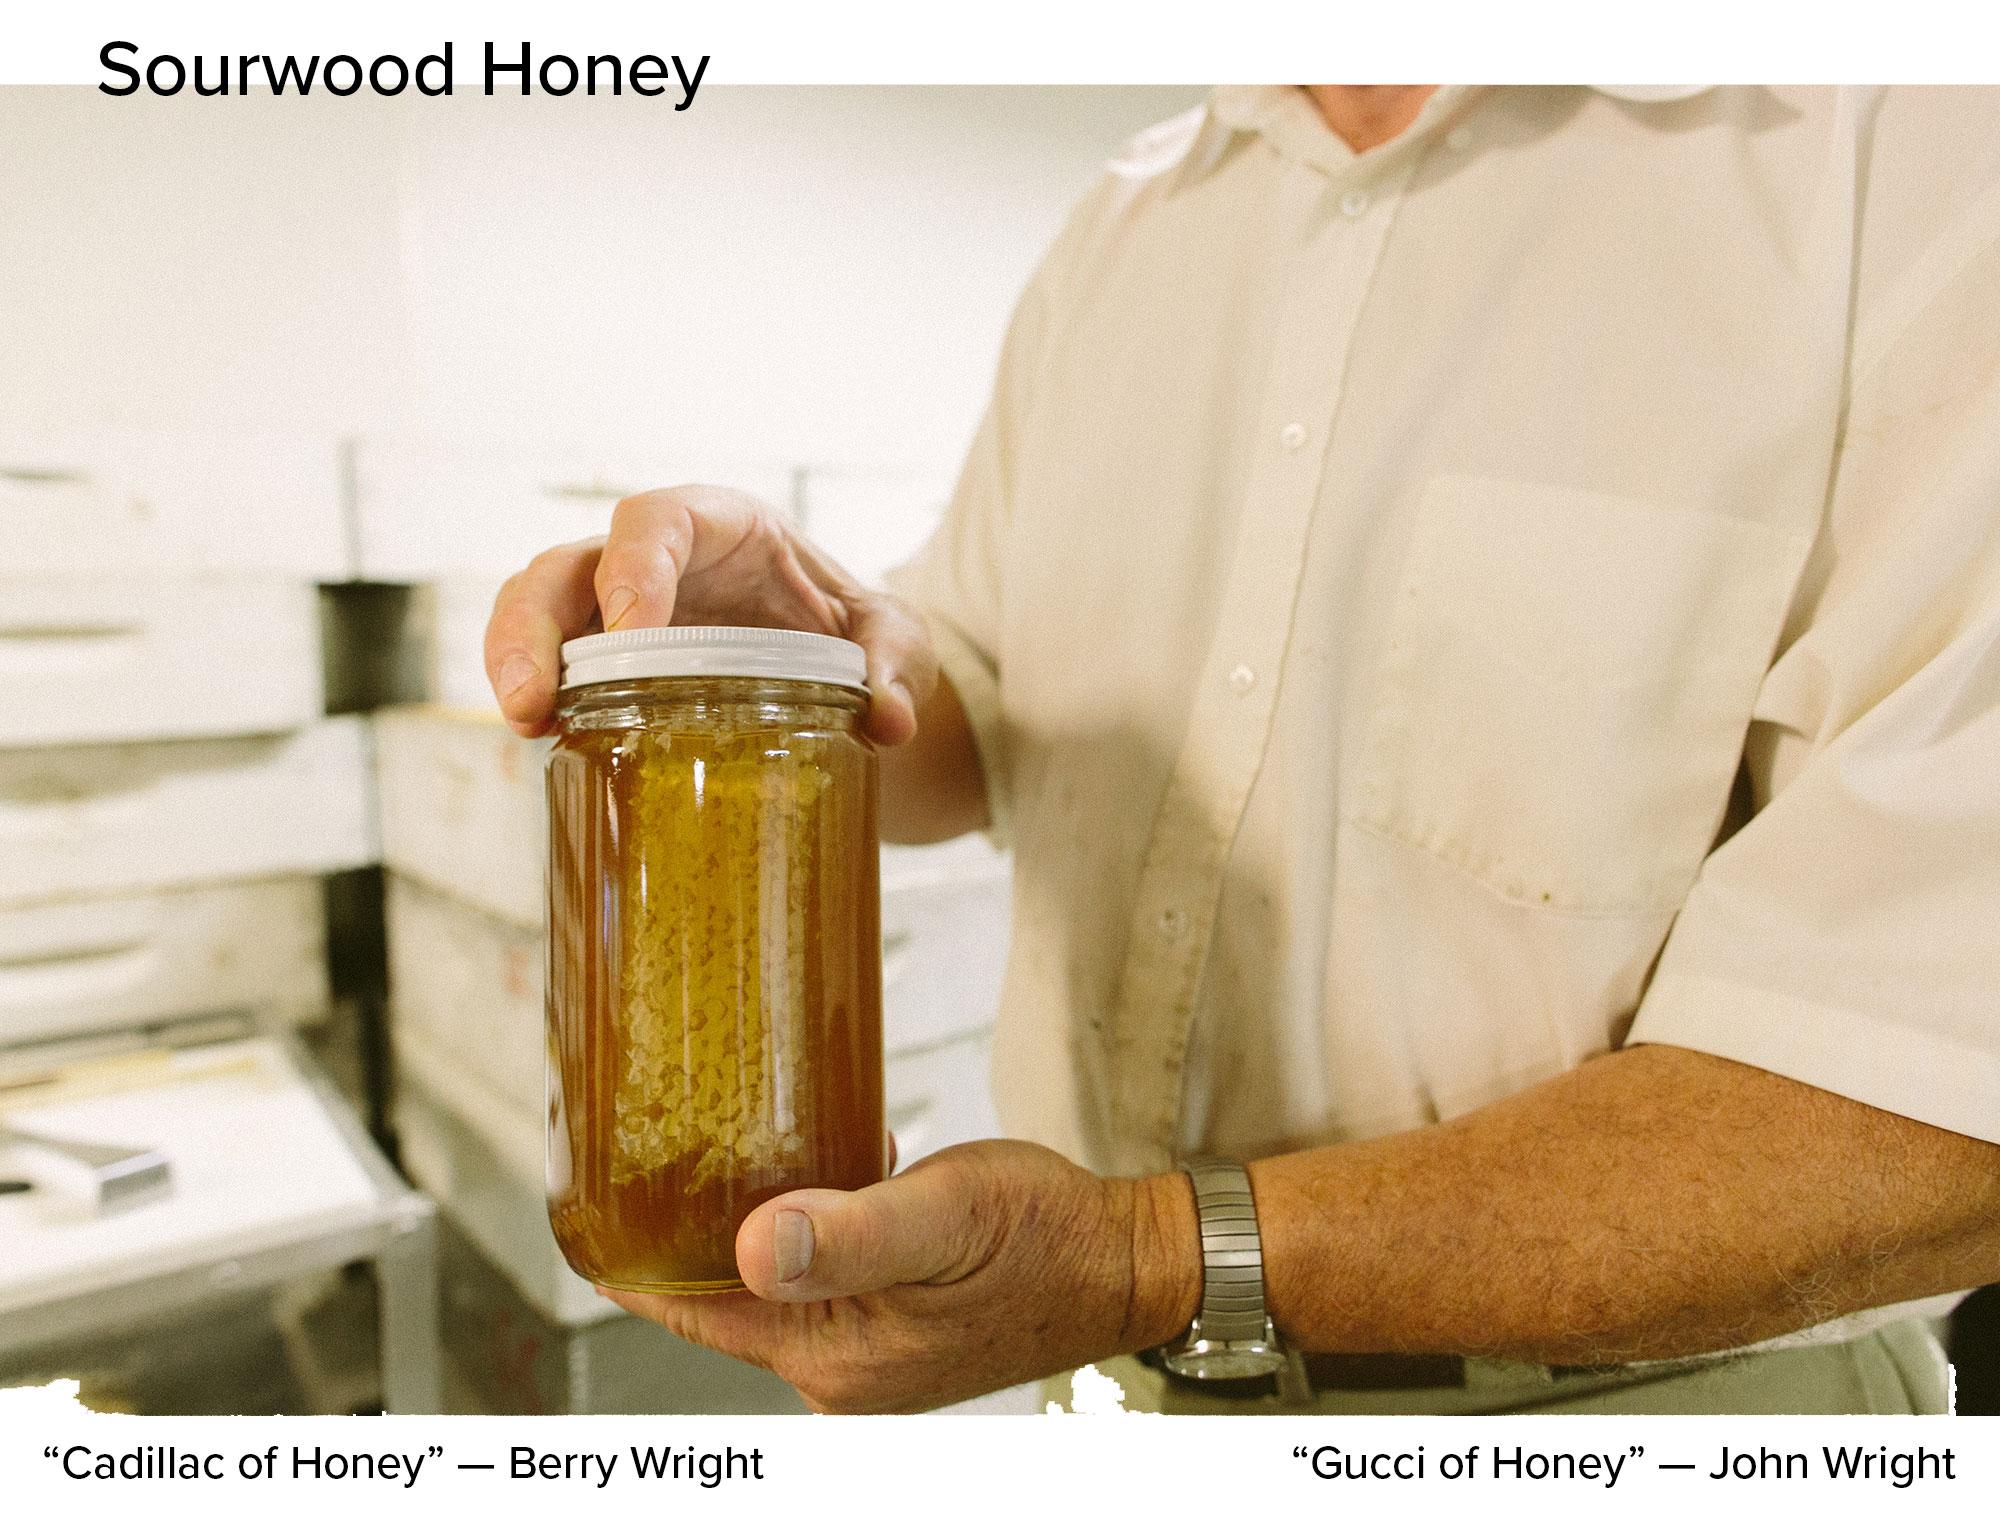 Sourwood Honey